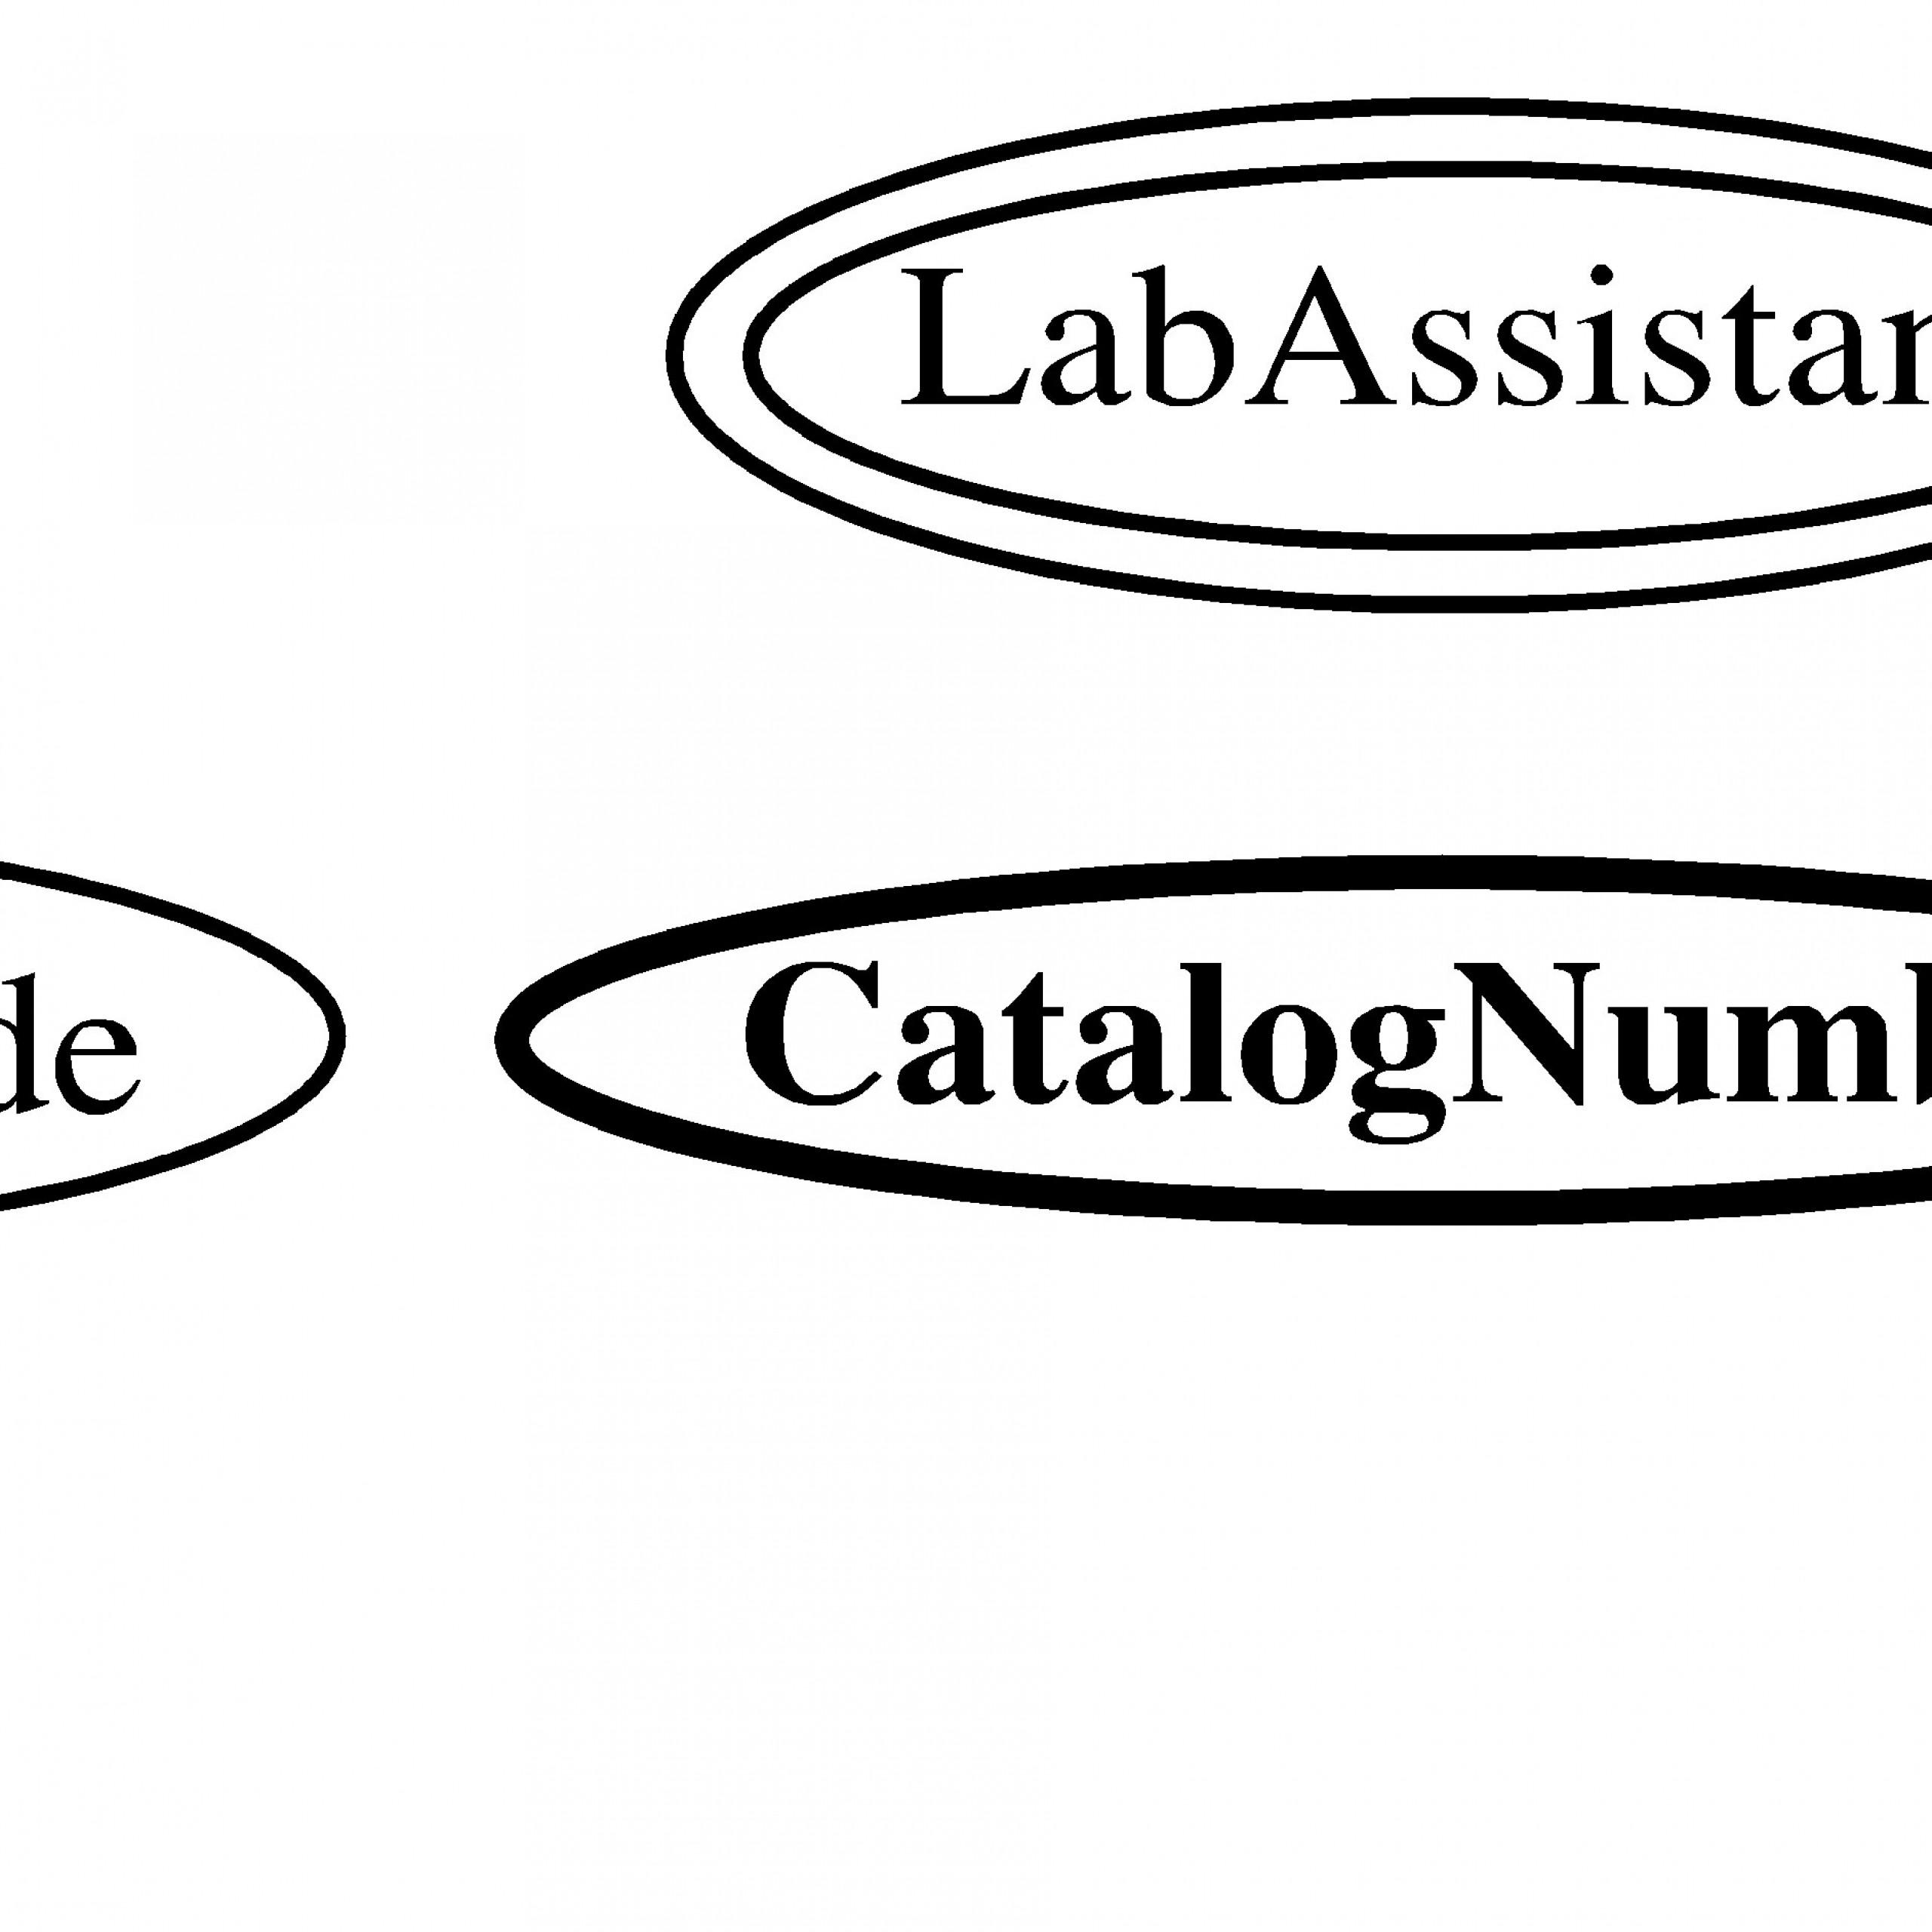 Entity-Relationship Model in What Is Er Model